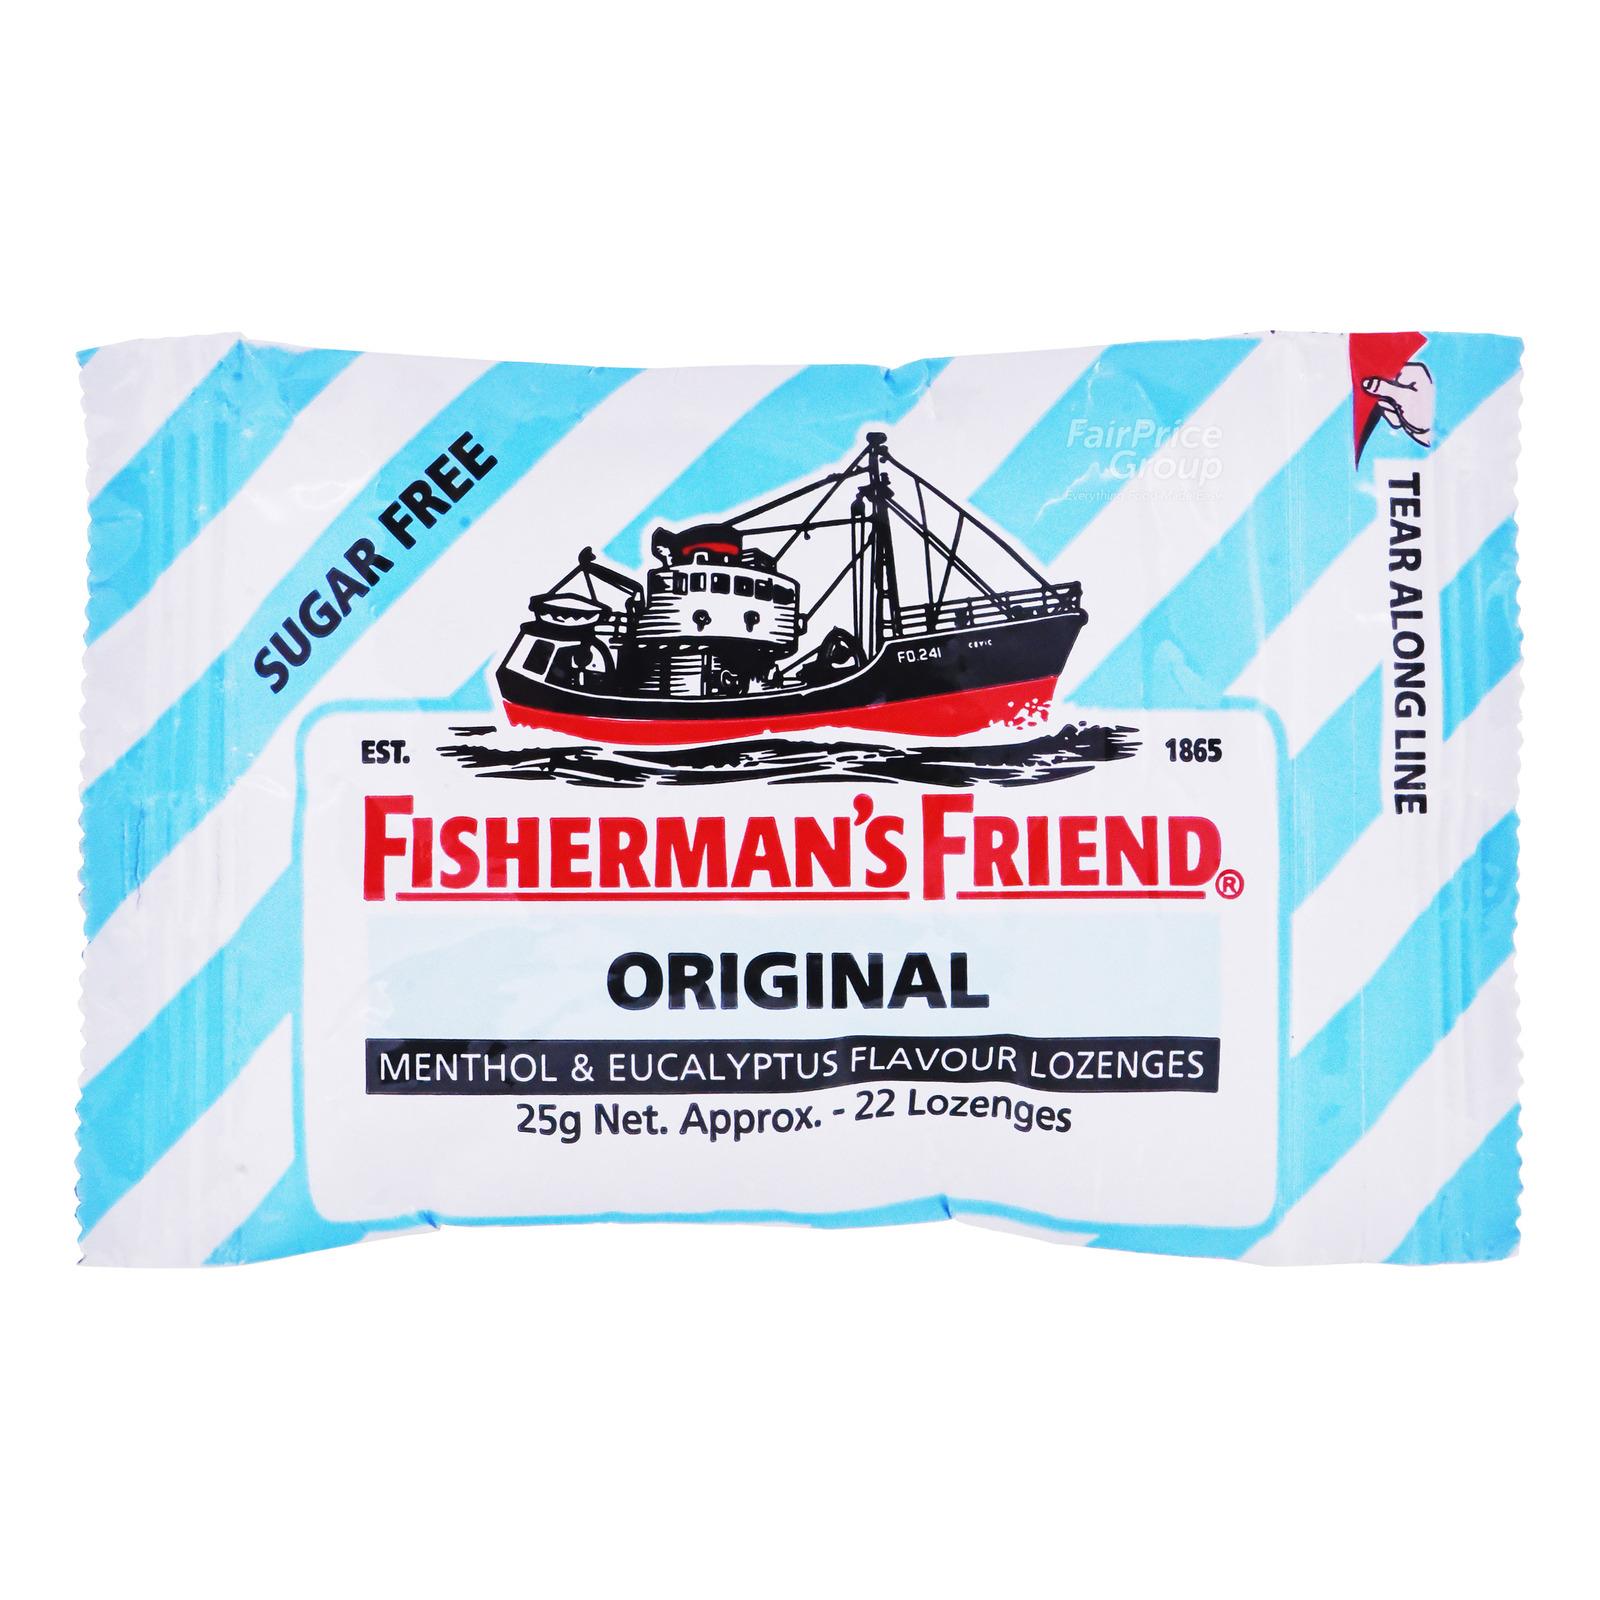 Fisherman's Friend Sugar Free Lozenges - Original (Extra Strong)